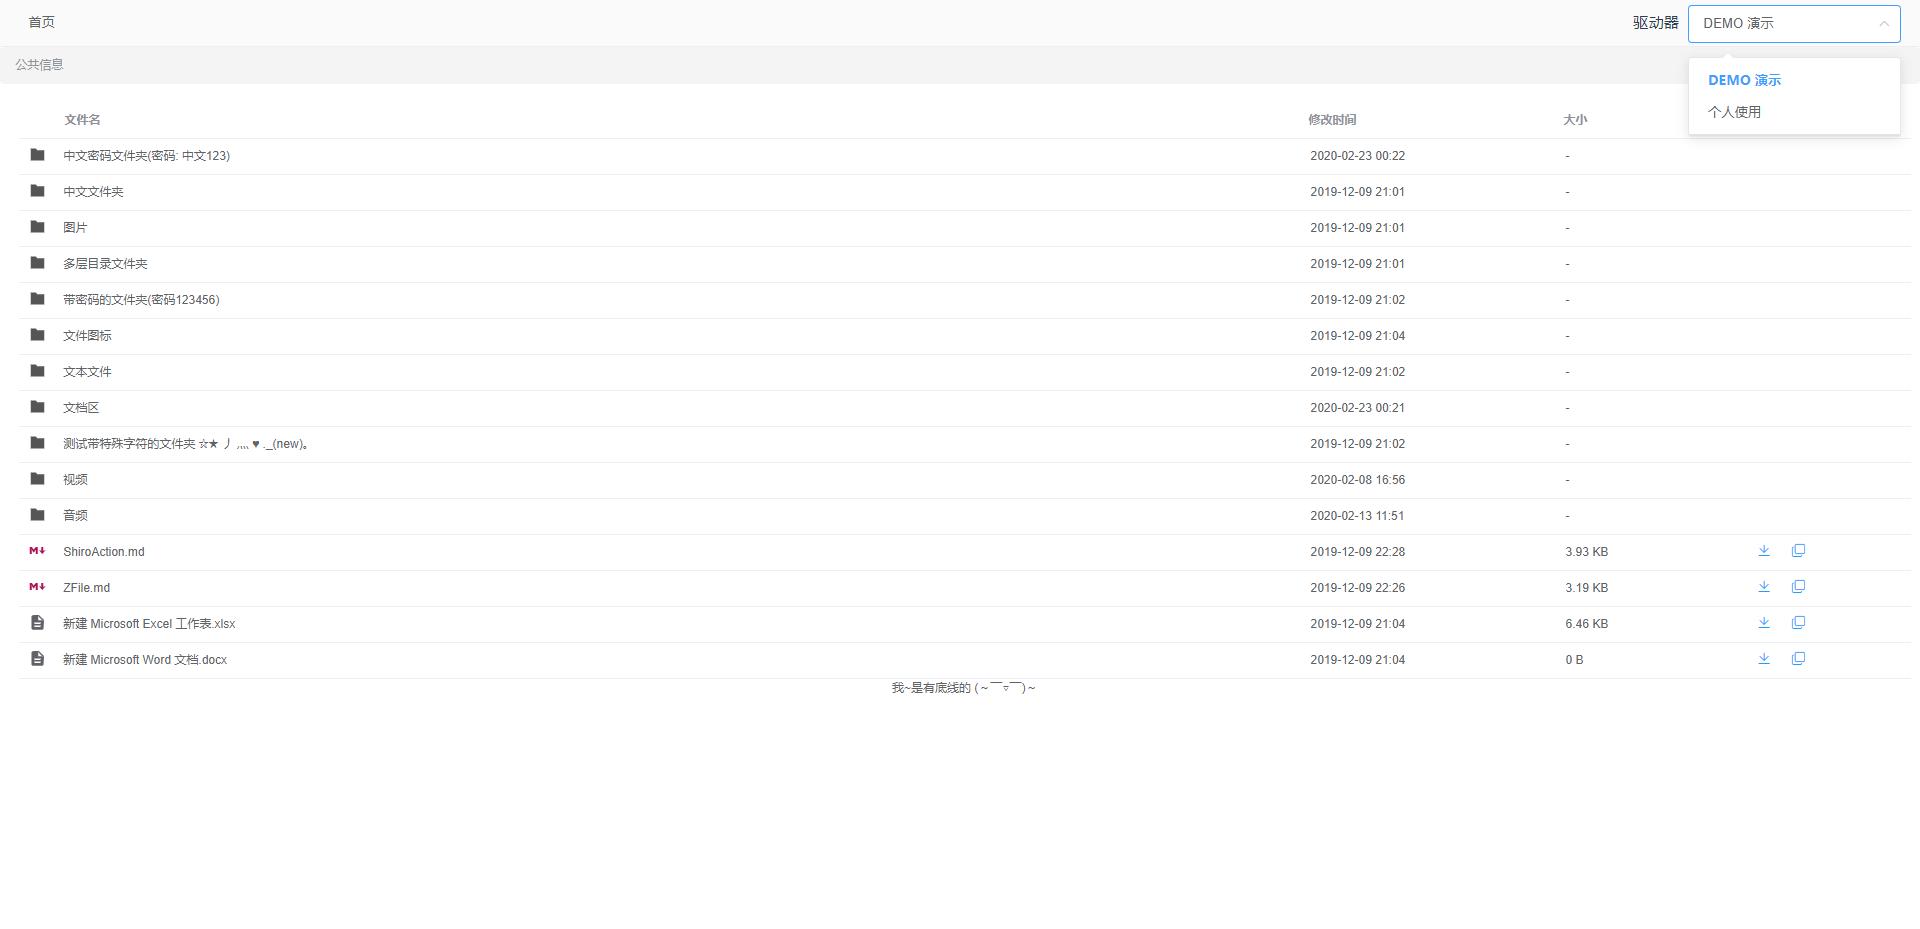 ZFILE 3.0 版发布,加载速度大幅优化